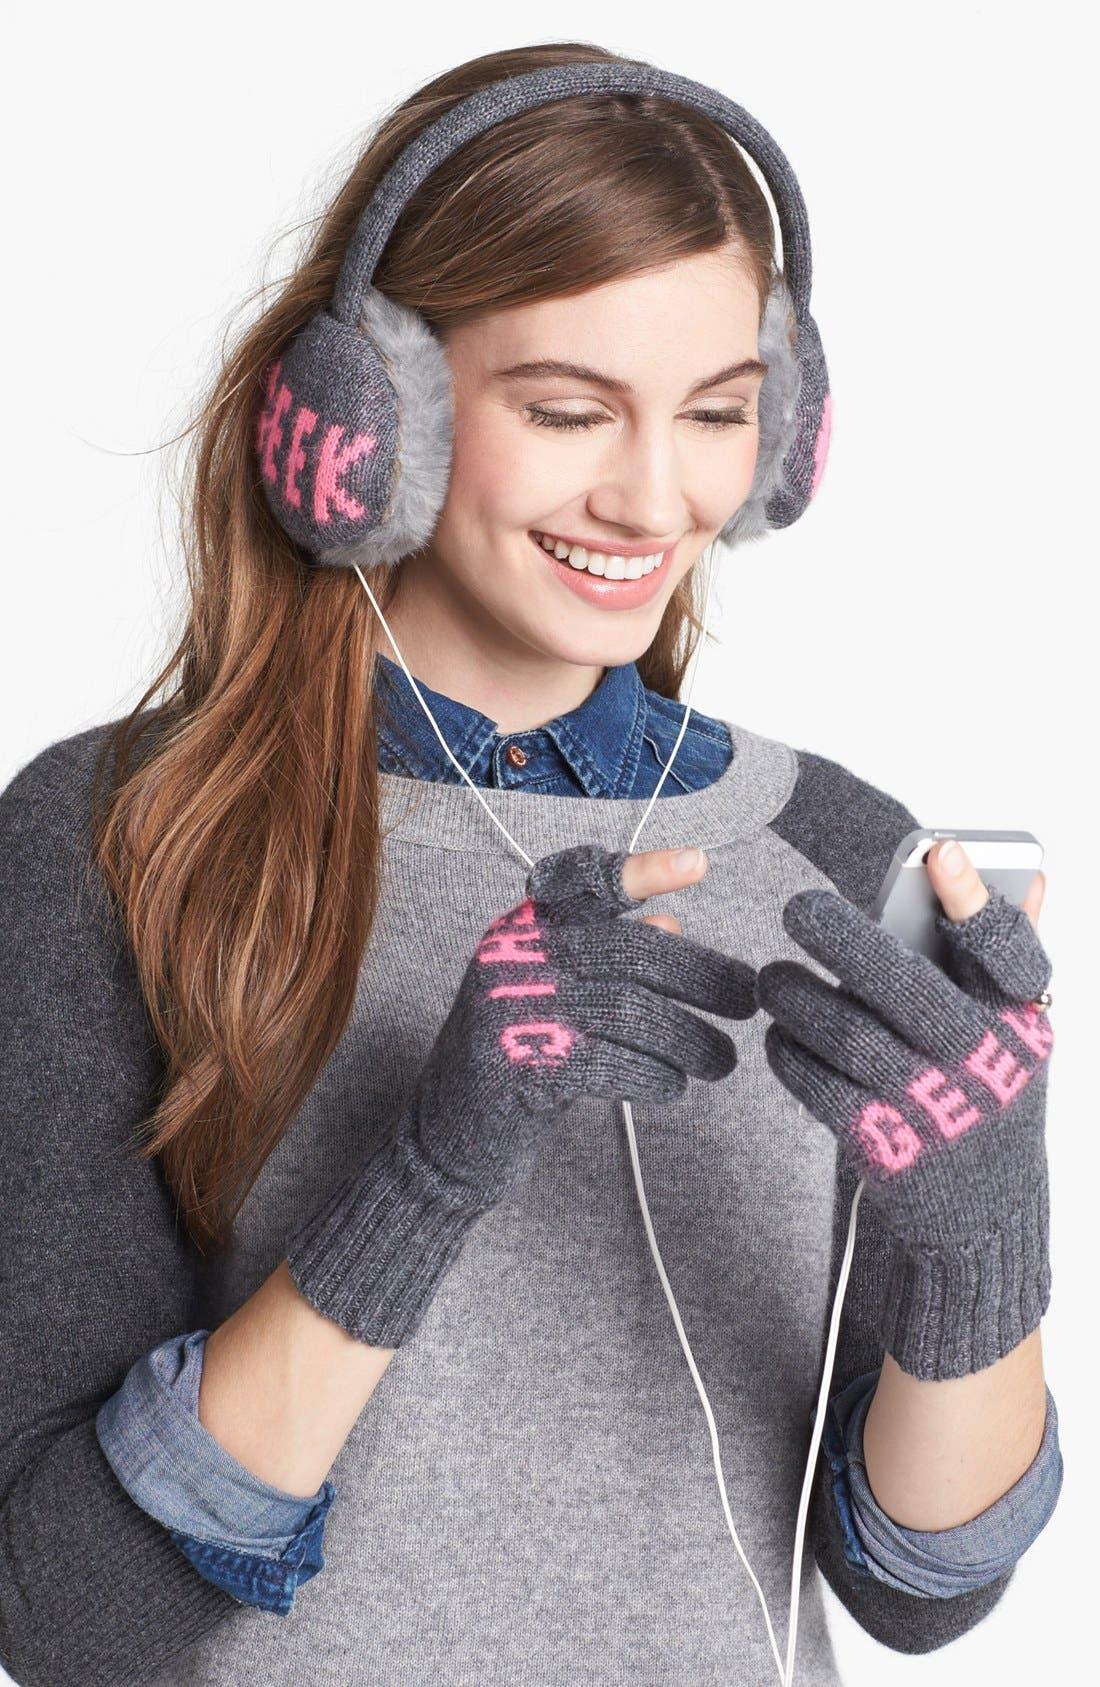 Alternate Image 1 Selected - kate spade new york 'geek chic' earmuffs